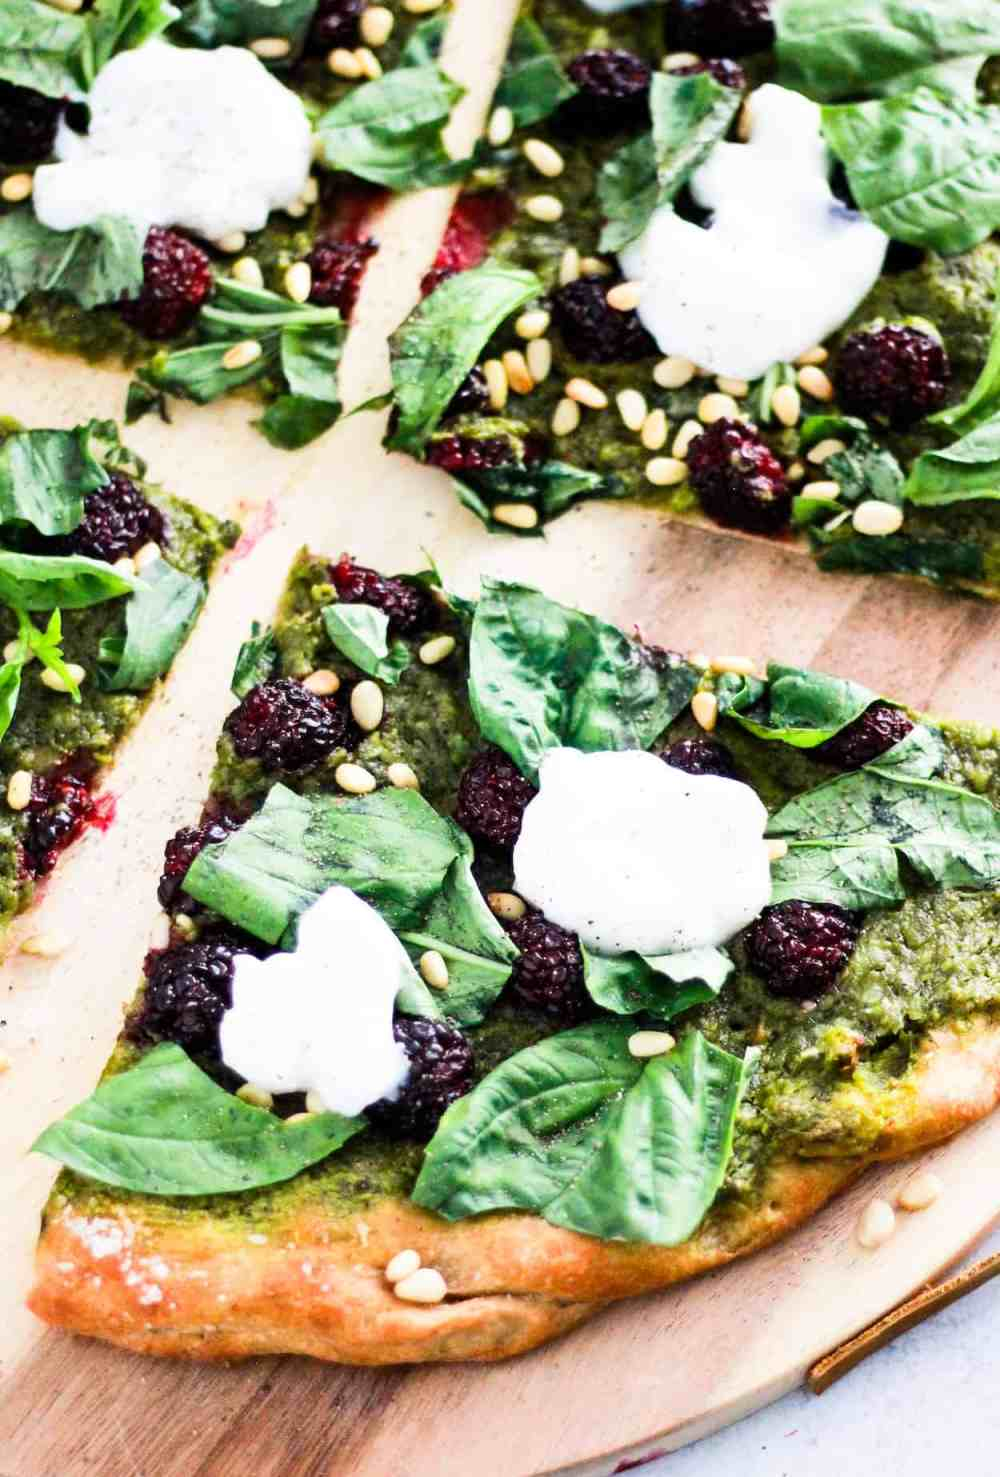 Sliced green Vegan Pesto Pizza with blackberries on wood board.